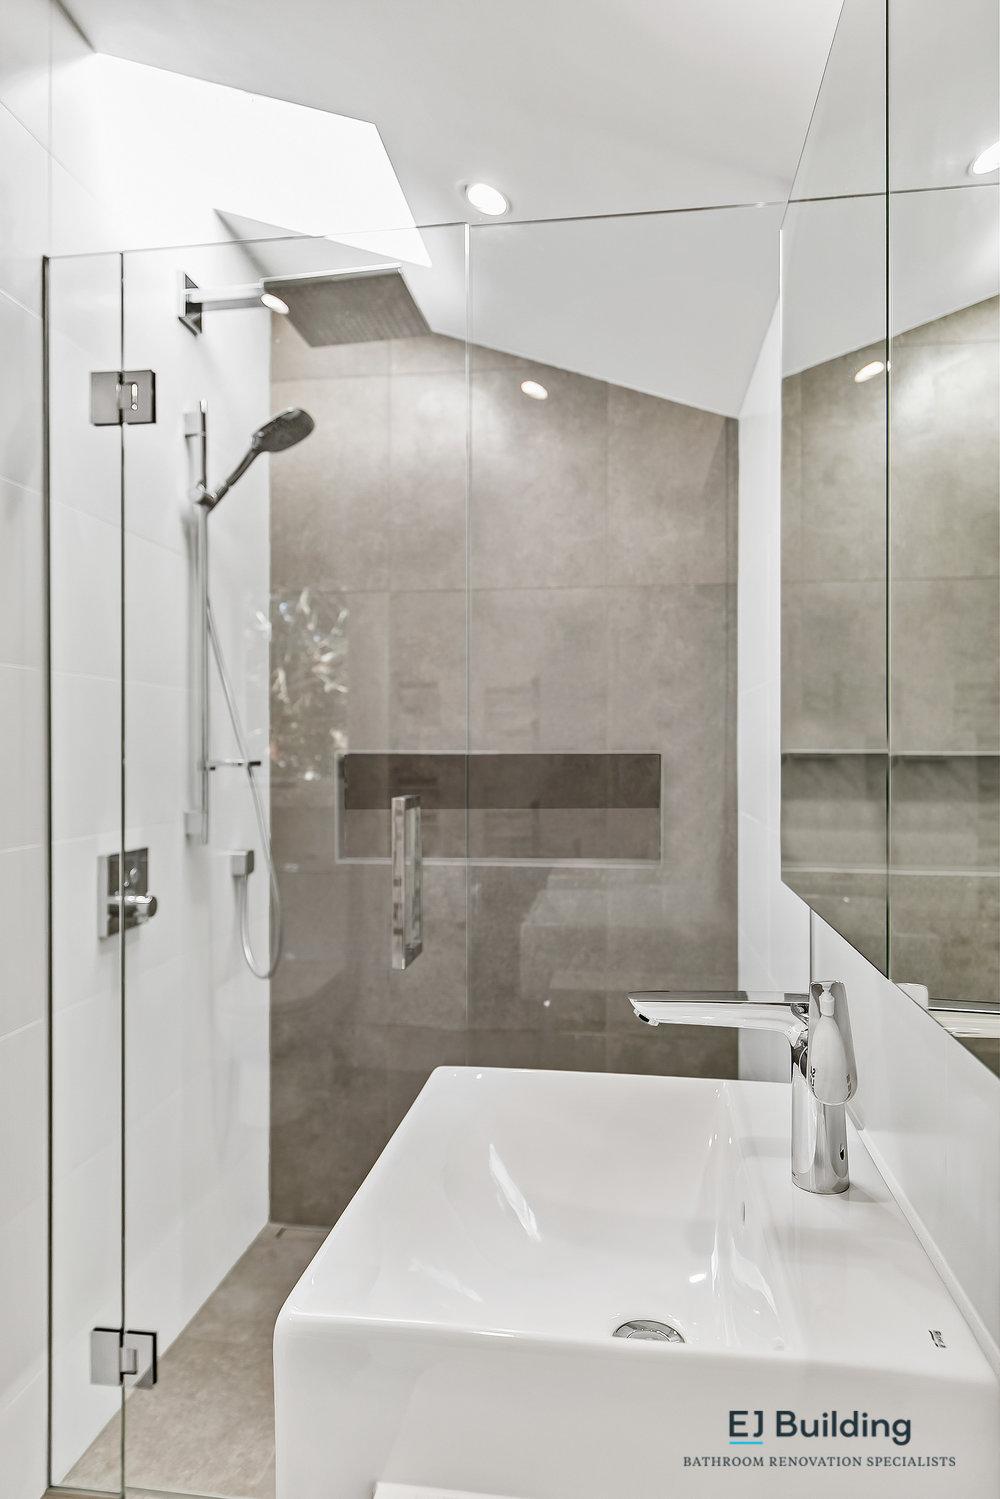 Ellerslie bathroom renovator Auckland. Shower with good diamond fusion reviews . Bathroom Renovation by E J Building Bathroom renovators In Auckland.